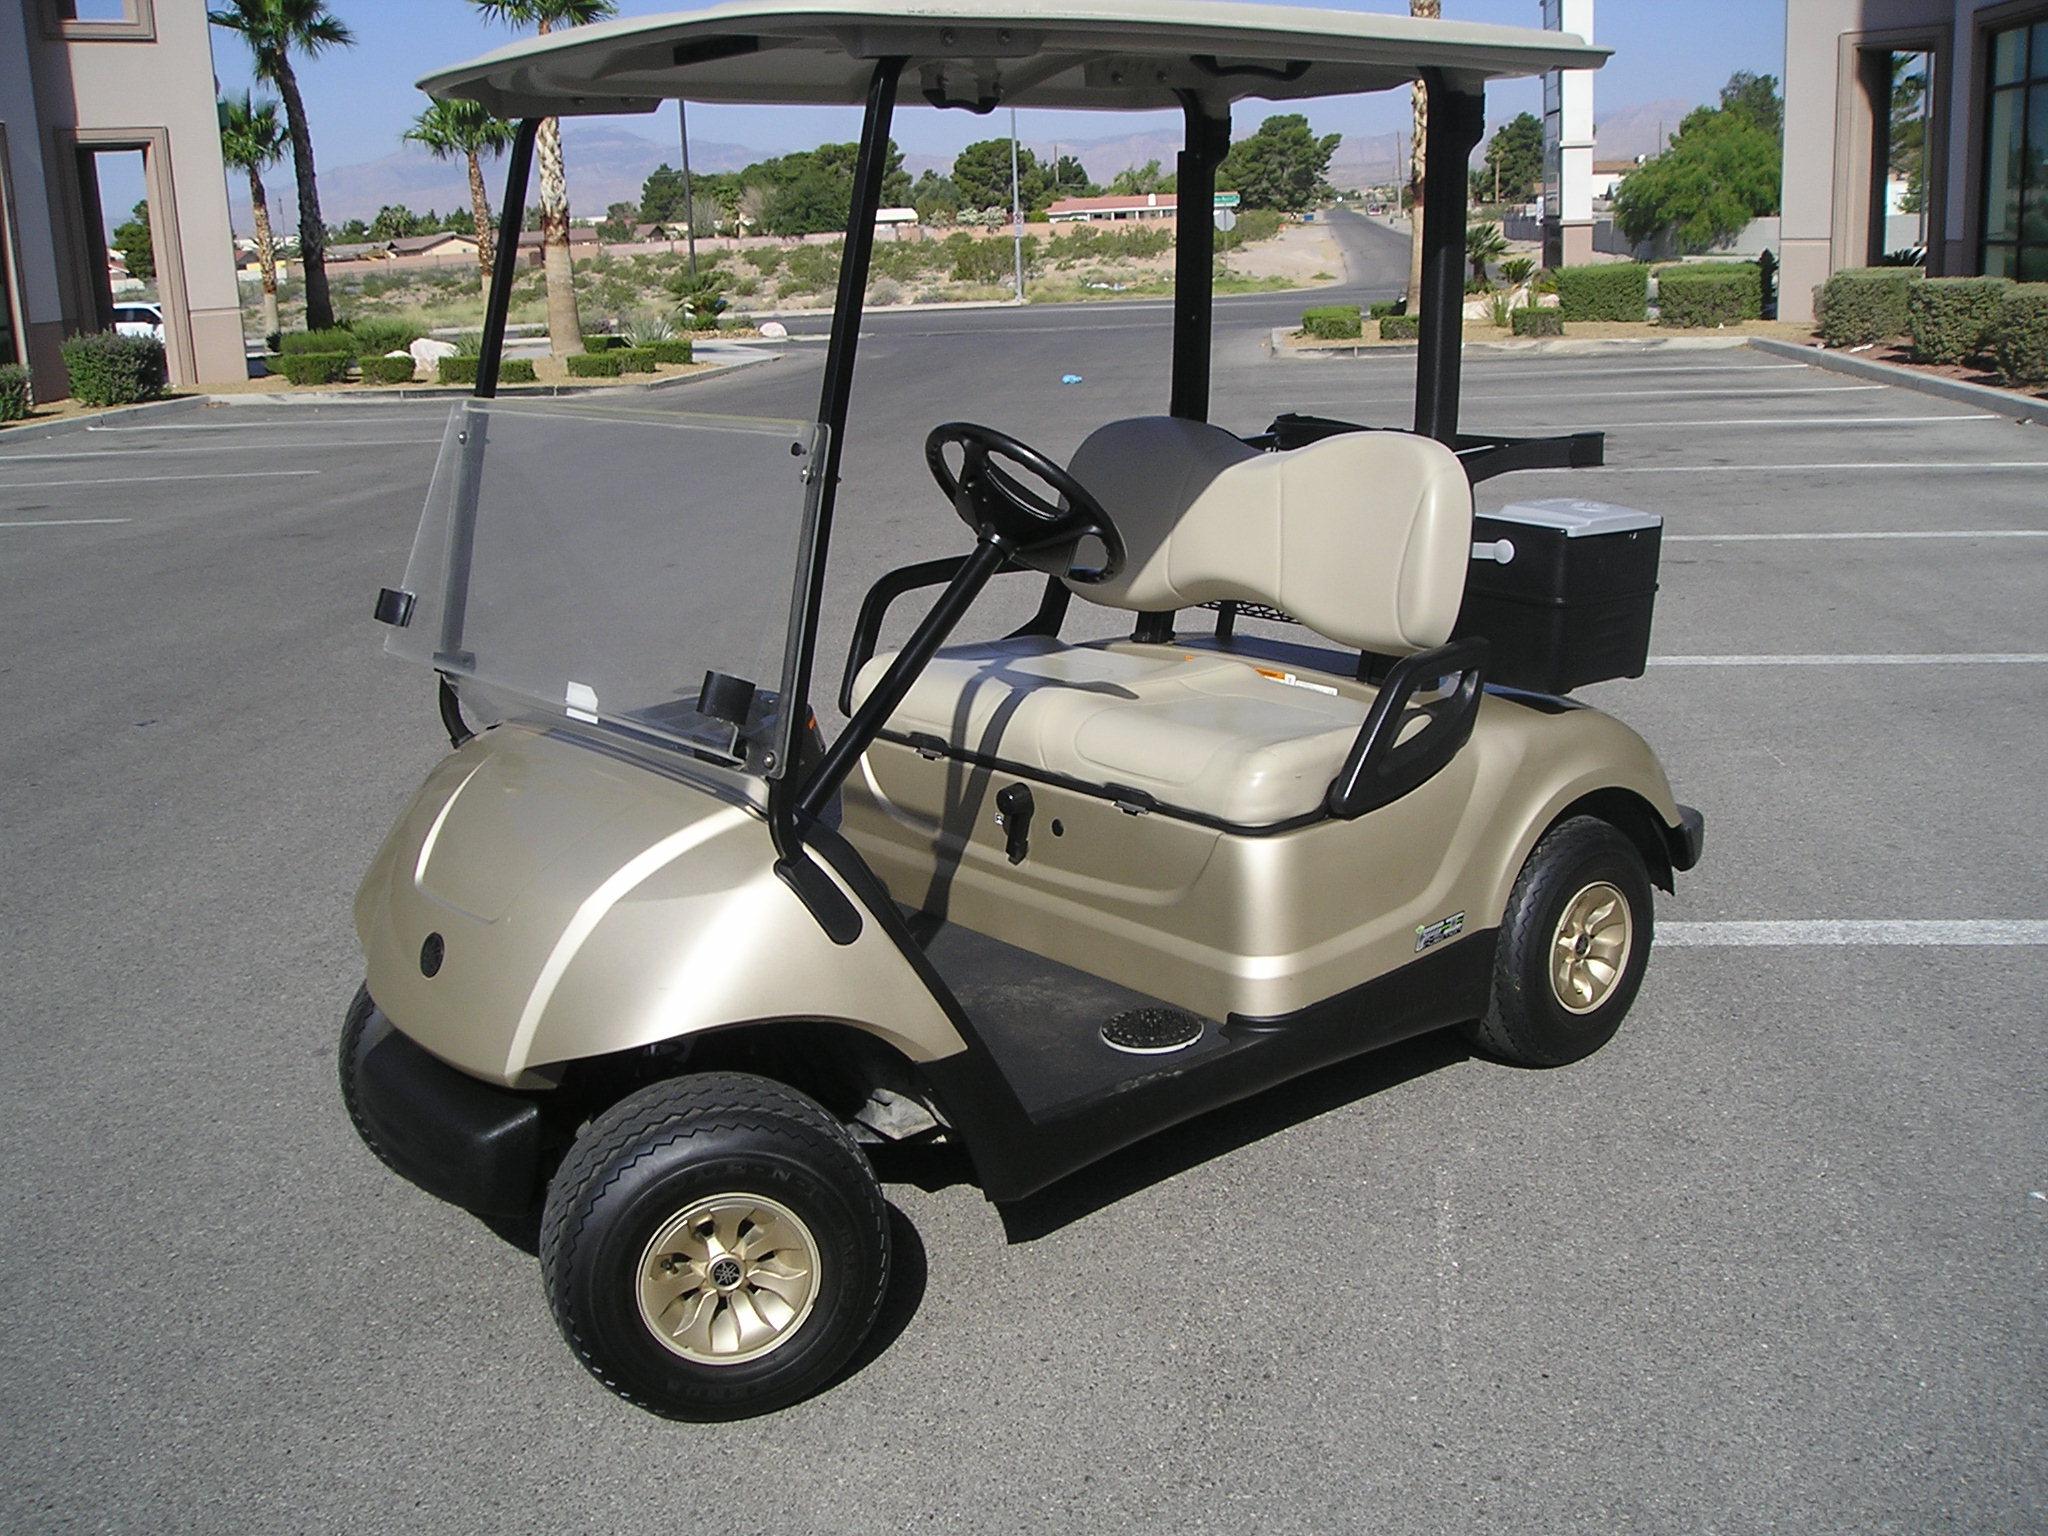 2014 Yamaha EFI Gas Cart | Wheels In Motion on 2009 club car precedent golf cart, 2008 yamaha golf cart, 2009 yamaha golf cart specs, 2015 yamaha ptv golf cart, 2010 ezgo electric golf cart, 2009 yamaha golf cart models, 2009 yamaha golf cart value, yamaha g9 golf cart, 2008 yamaha ydra gas cart, one person golf cart, yamaha drive golf cart, 2009 yamaha golf cart manual, 1986 sun classic golf cart, yamaha g2 golf cart, 1999 yamaha g16 golf cart, 2007 yamaha ydra gas cart, yamaha super hauler cart, world's fastest golf cart, yamaha umax golf cart, yamaha ydra golf cart,